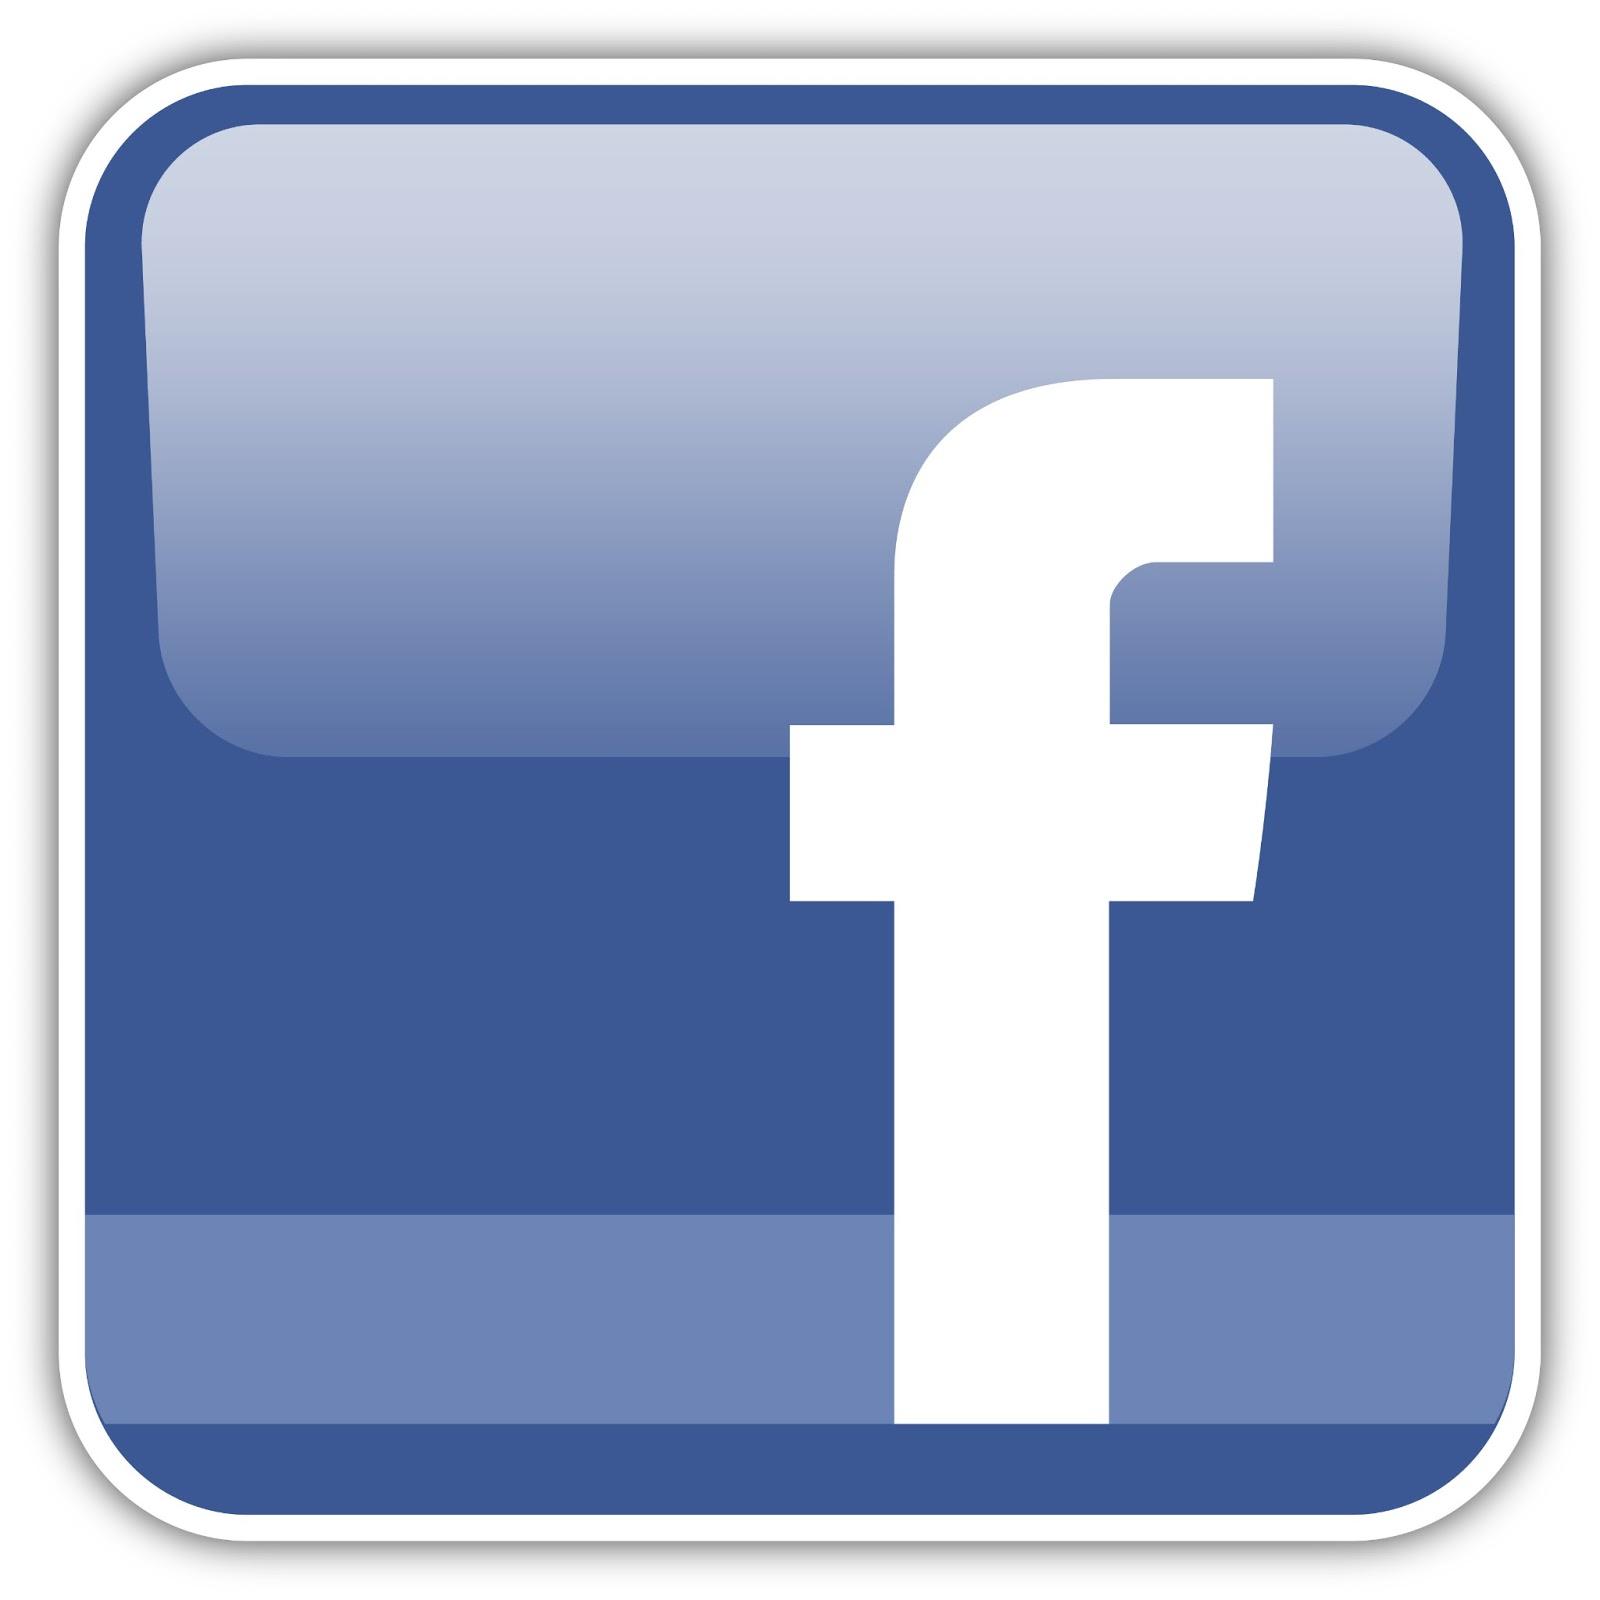 Facebook 4 1 1 ipa cracked